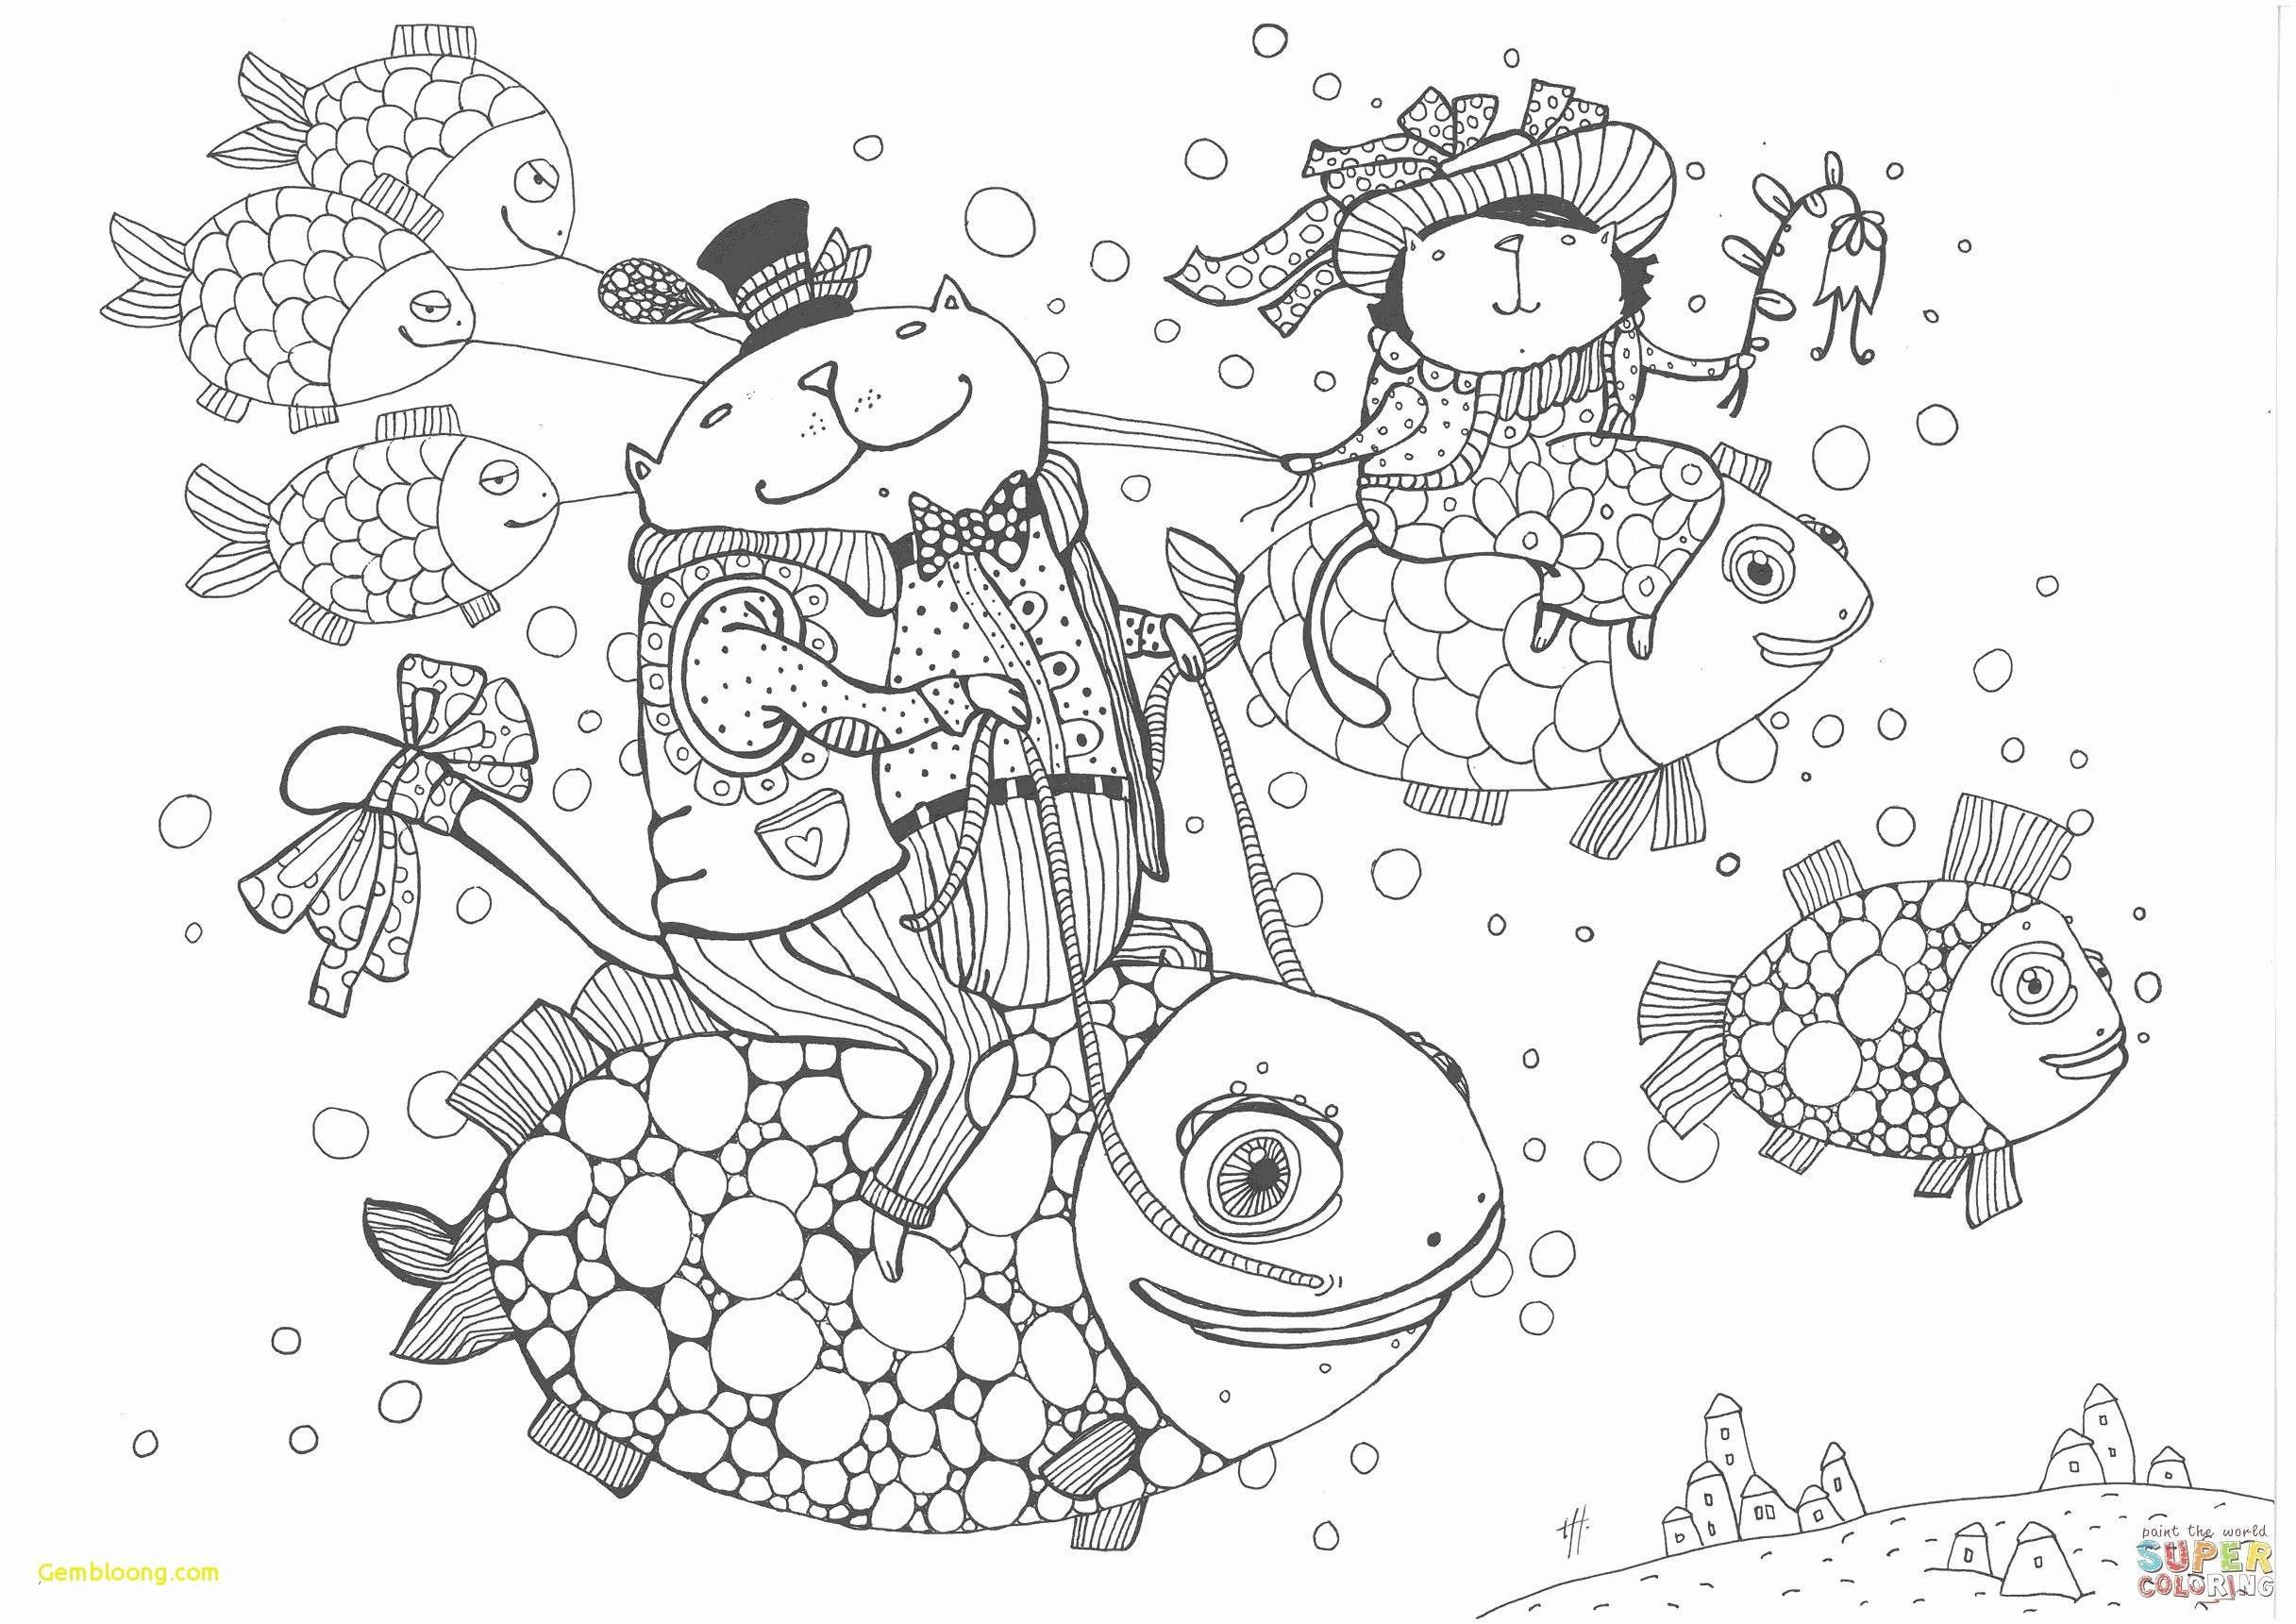 Mandala Bibi Und Tina Neu 35 Inspirierend Ausmalbilder Bibi Und Tina Mickeycarrollmunchkin Bilder